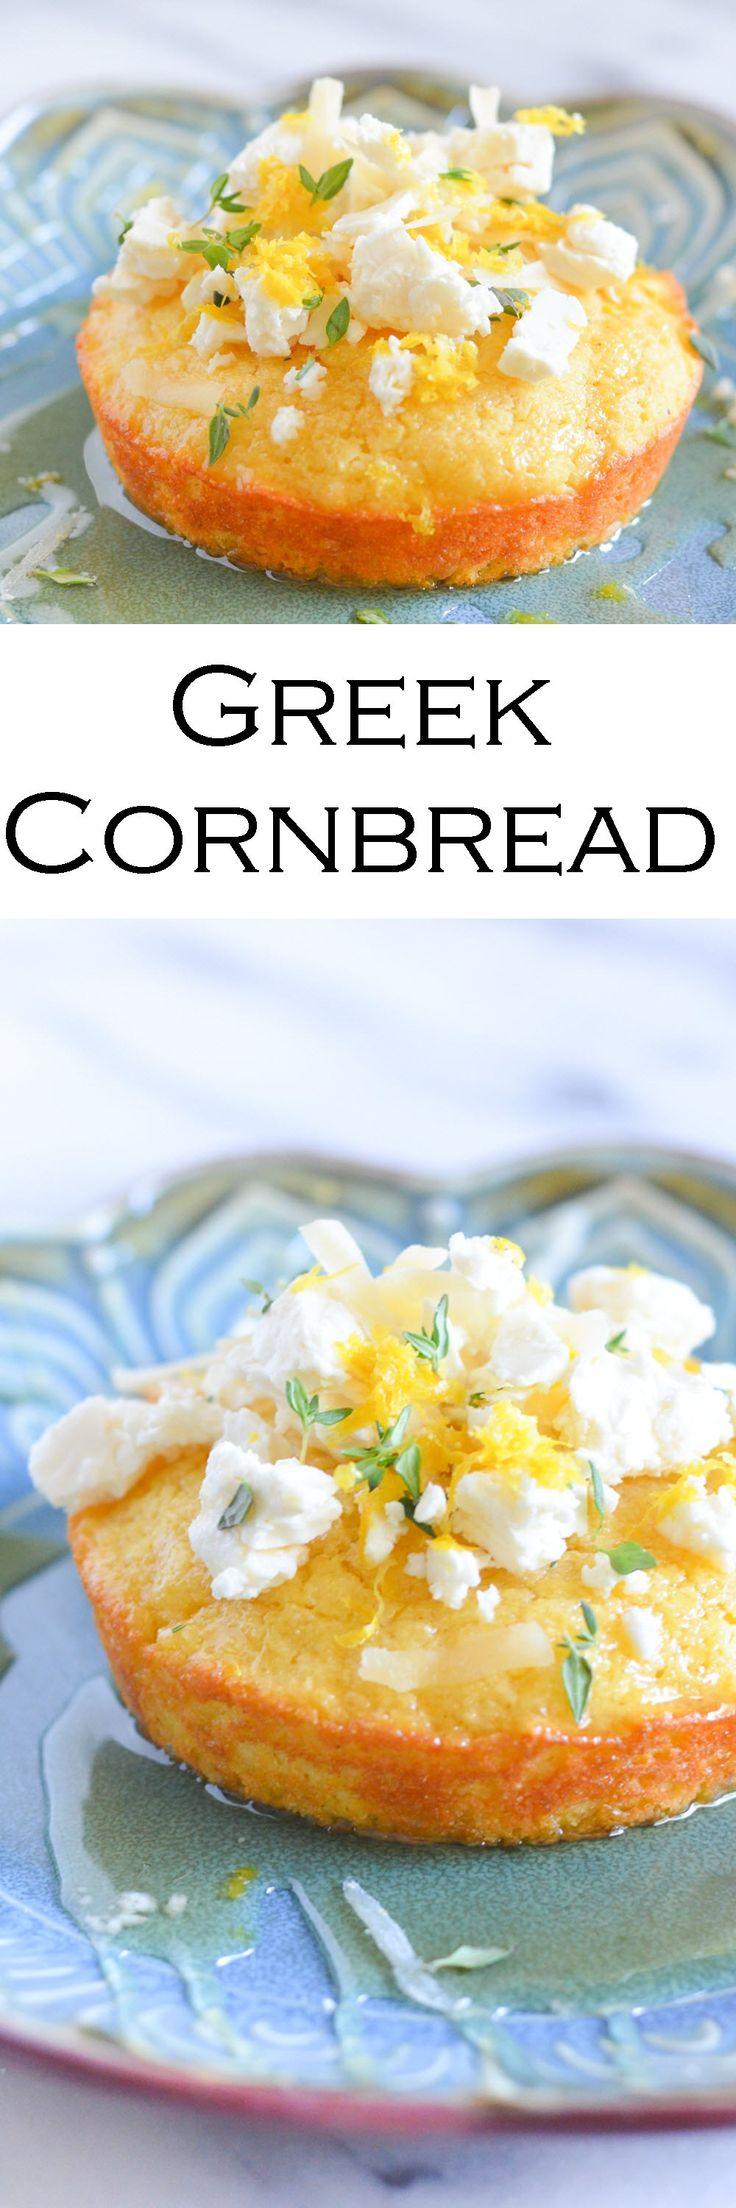 Greek Cornbread w. Honey, Feta, + Lemon #foodblogger #lucismorsels #cornbread #honey #feta #lemon